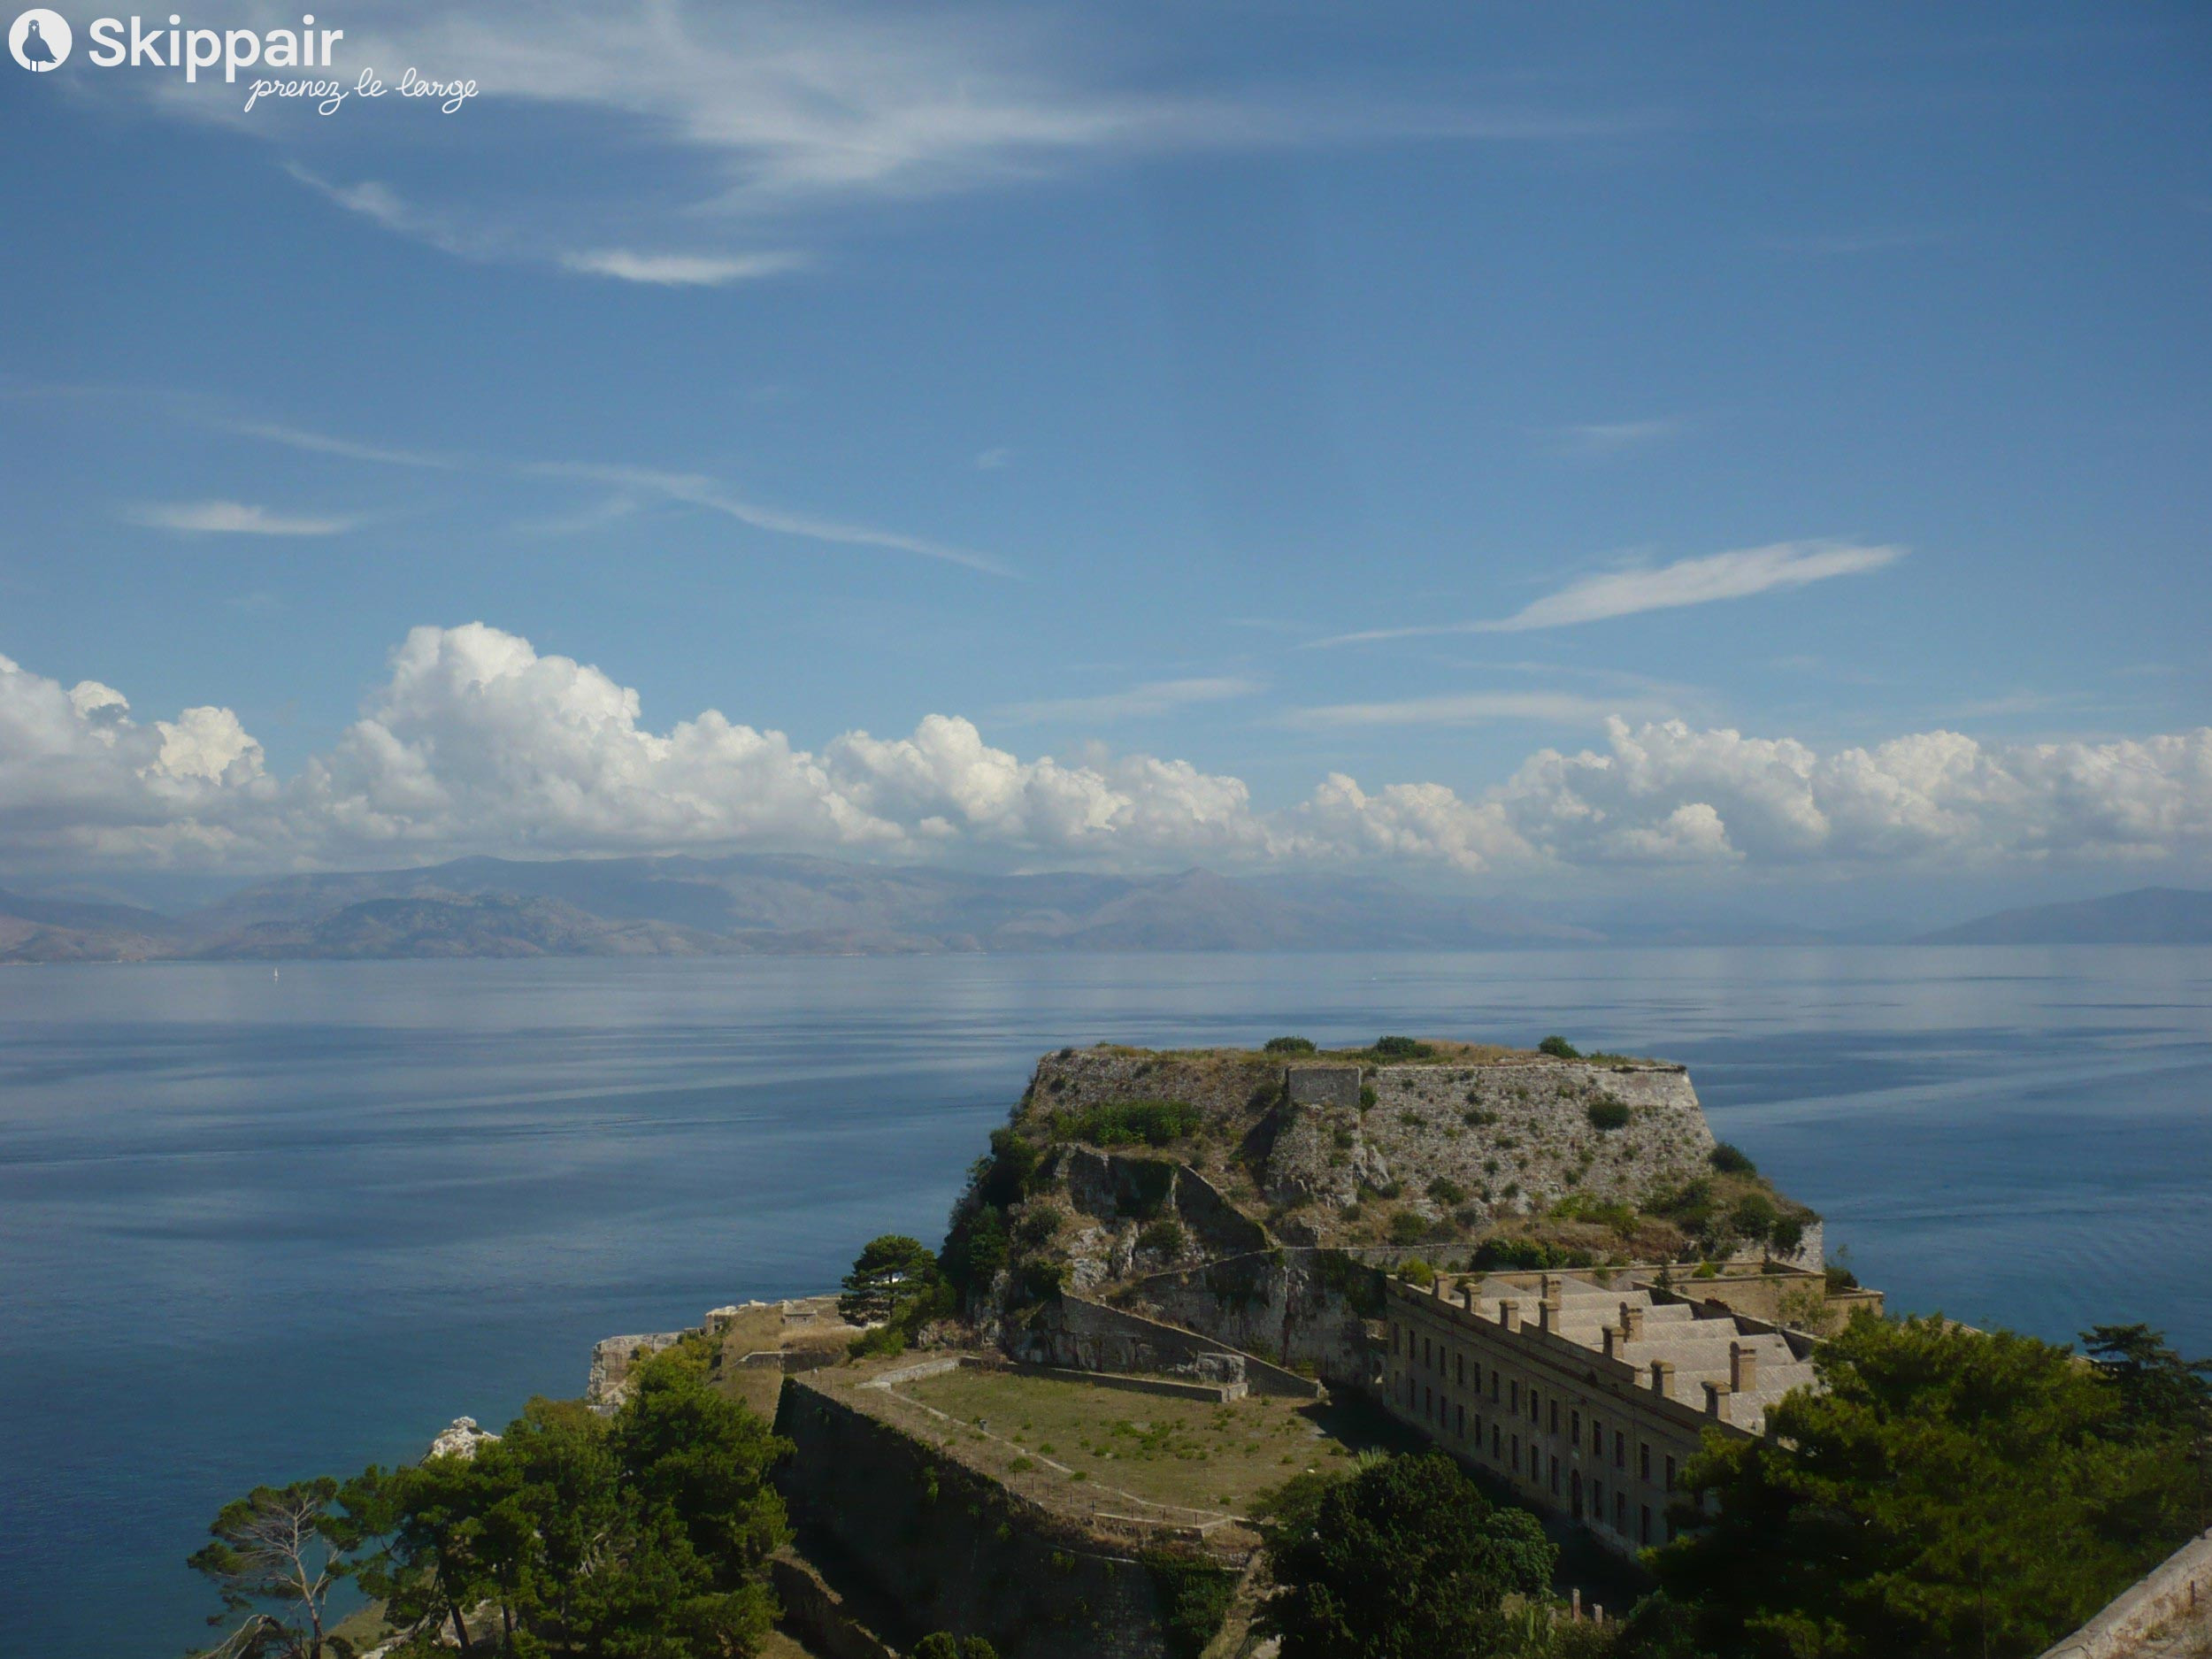 Old Fortress de Corfou - Skippair